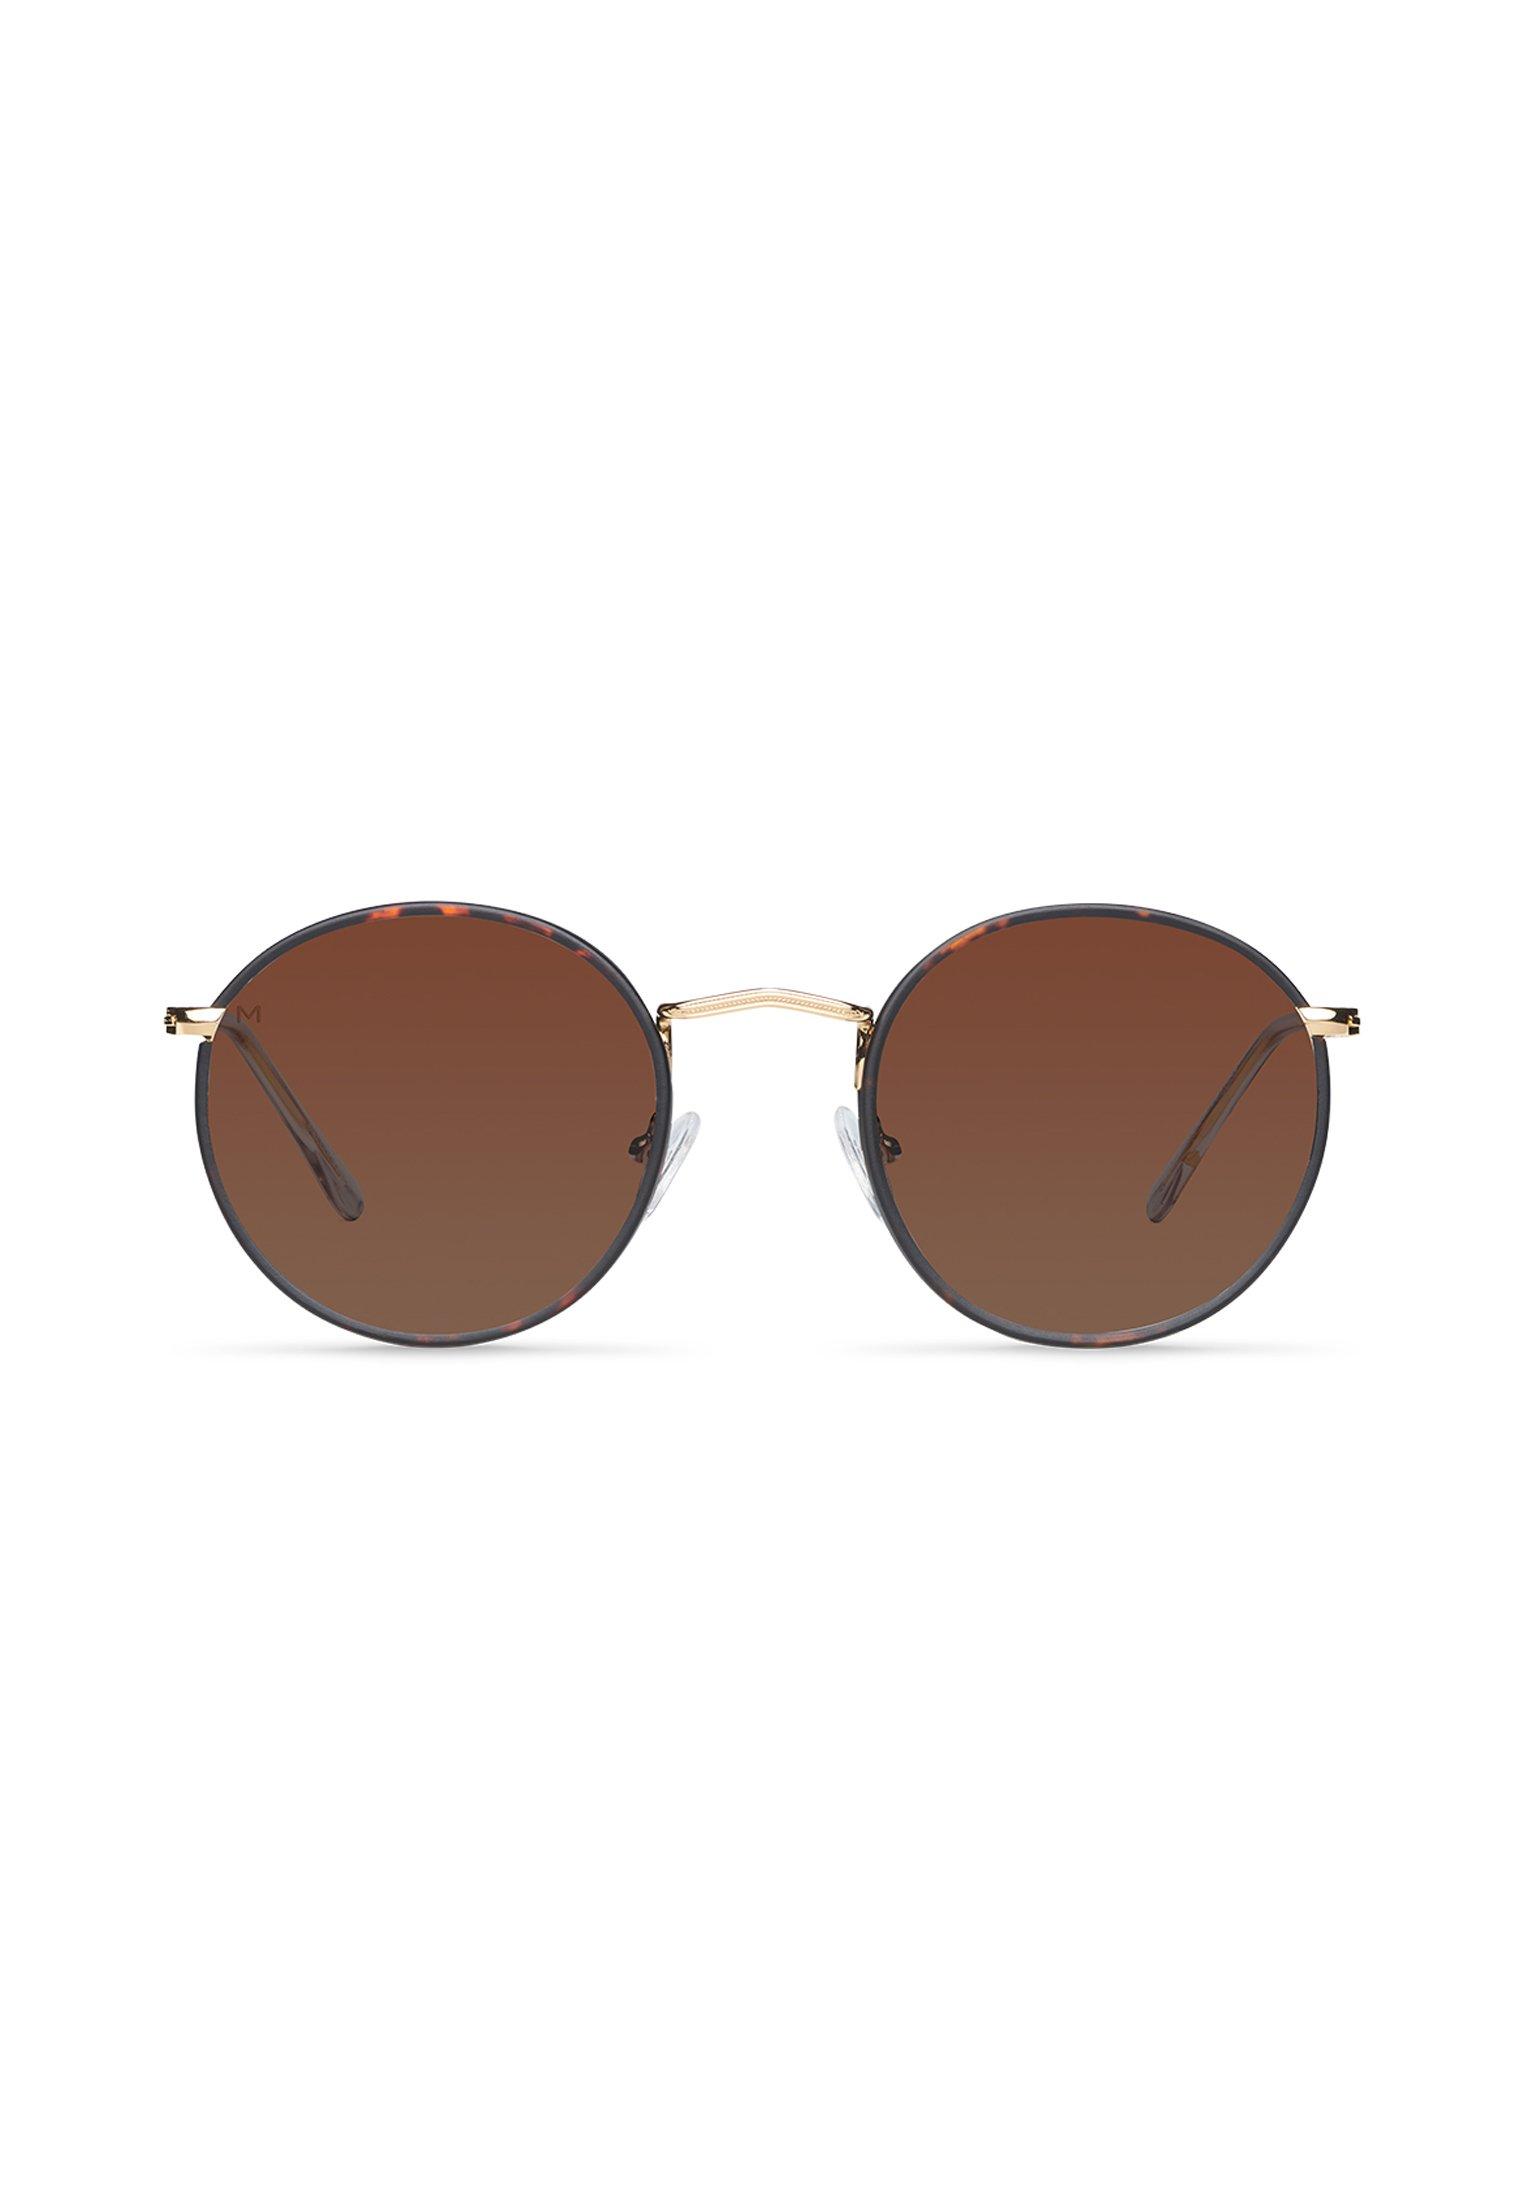 Kinder YEDEI BLUE LIGHT - Sonnenbrille